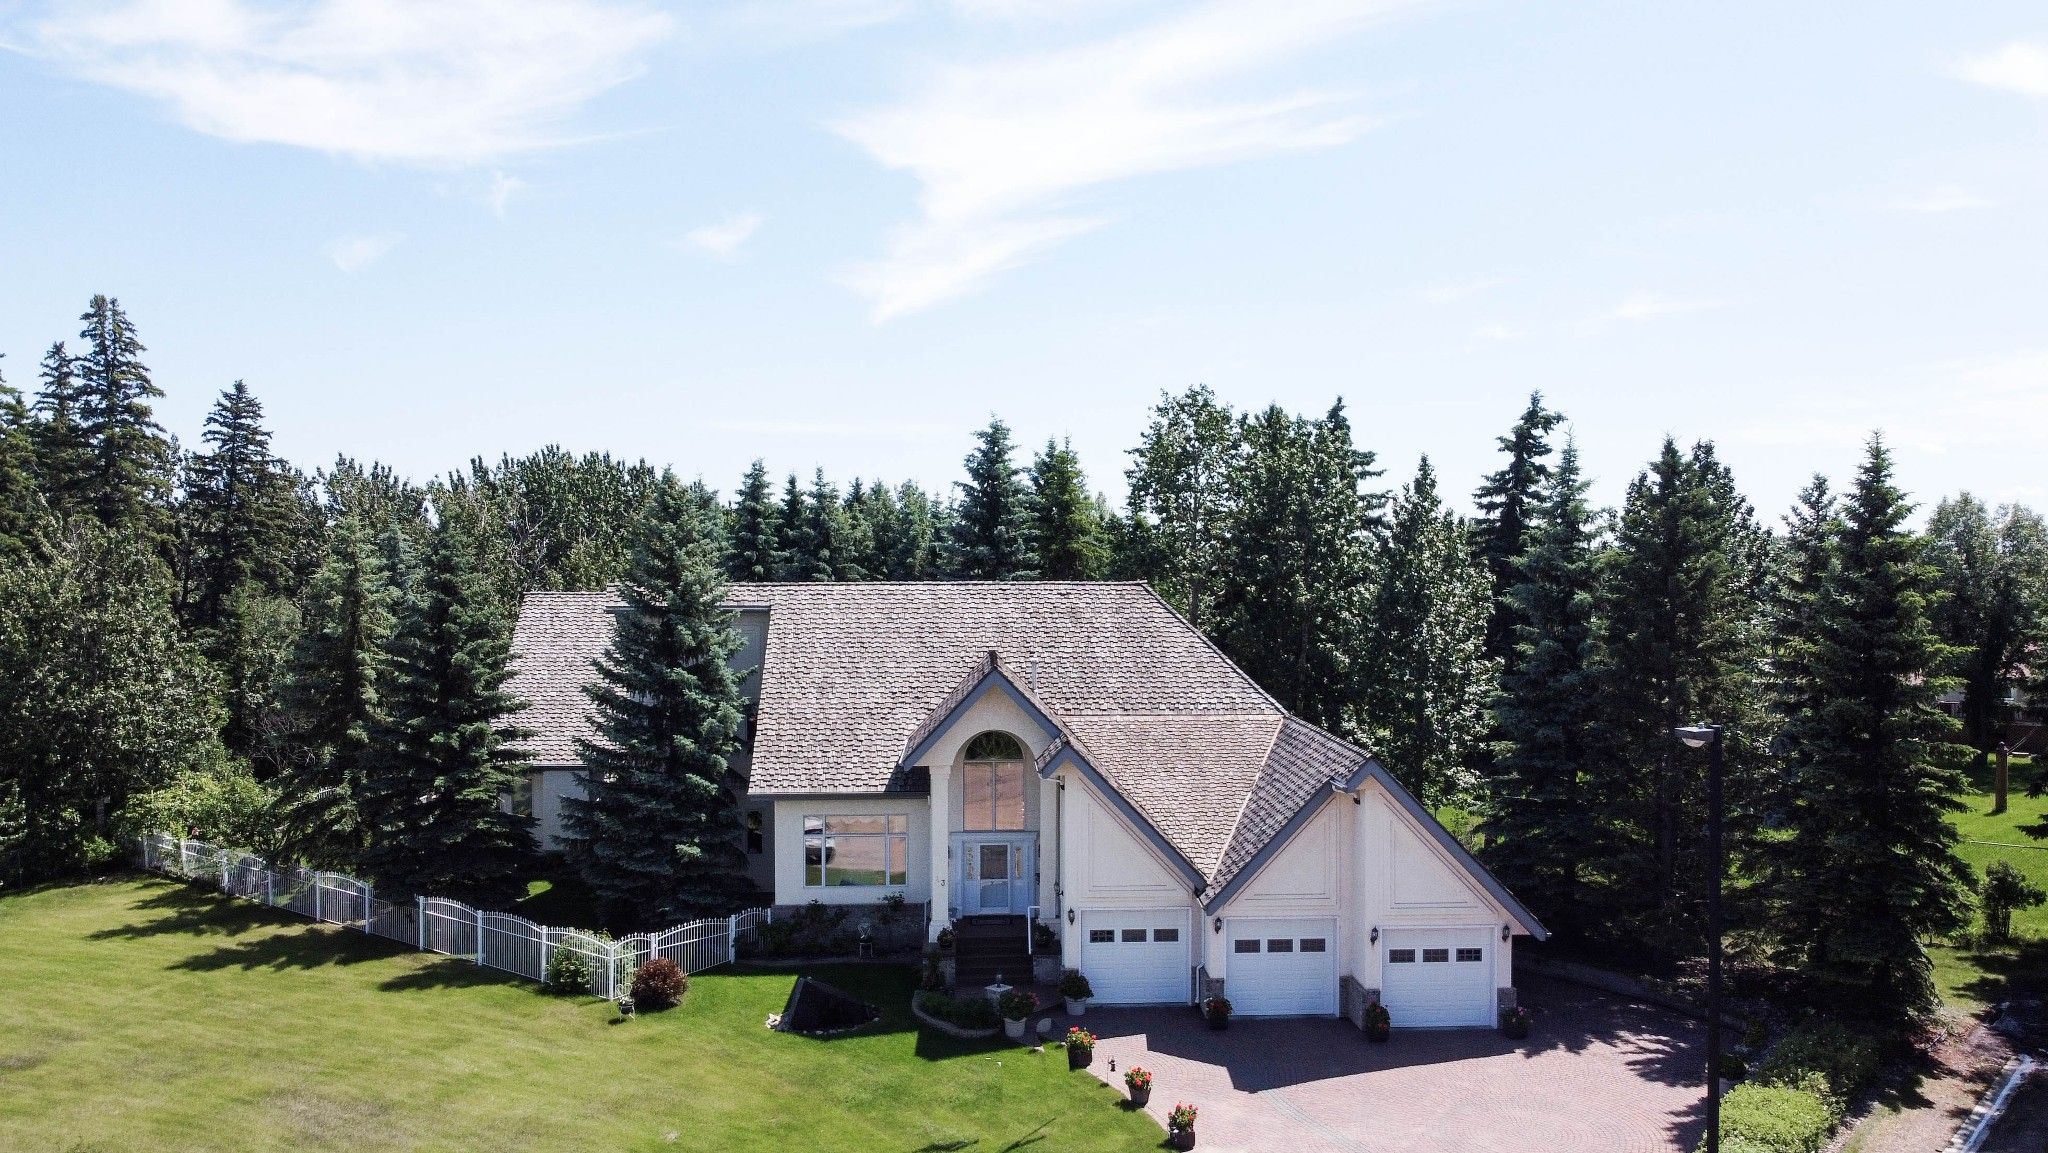 Main Photo: 43 Blackburn Drive in Edmonton: House for sale